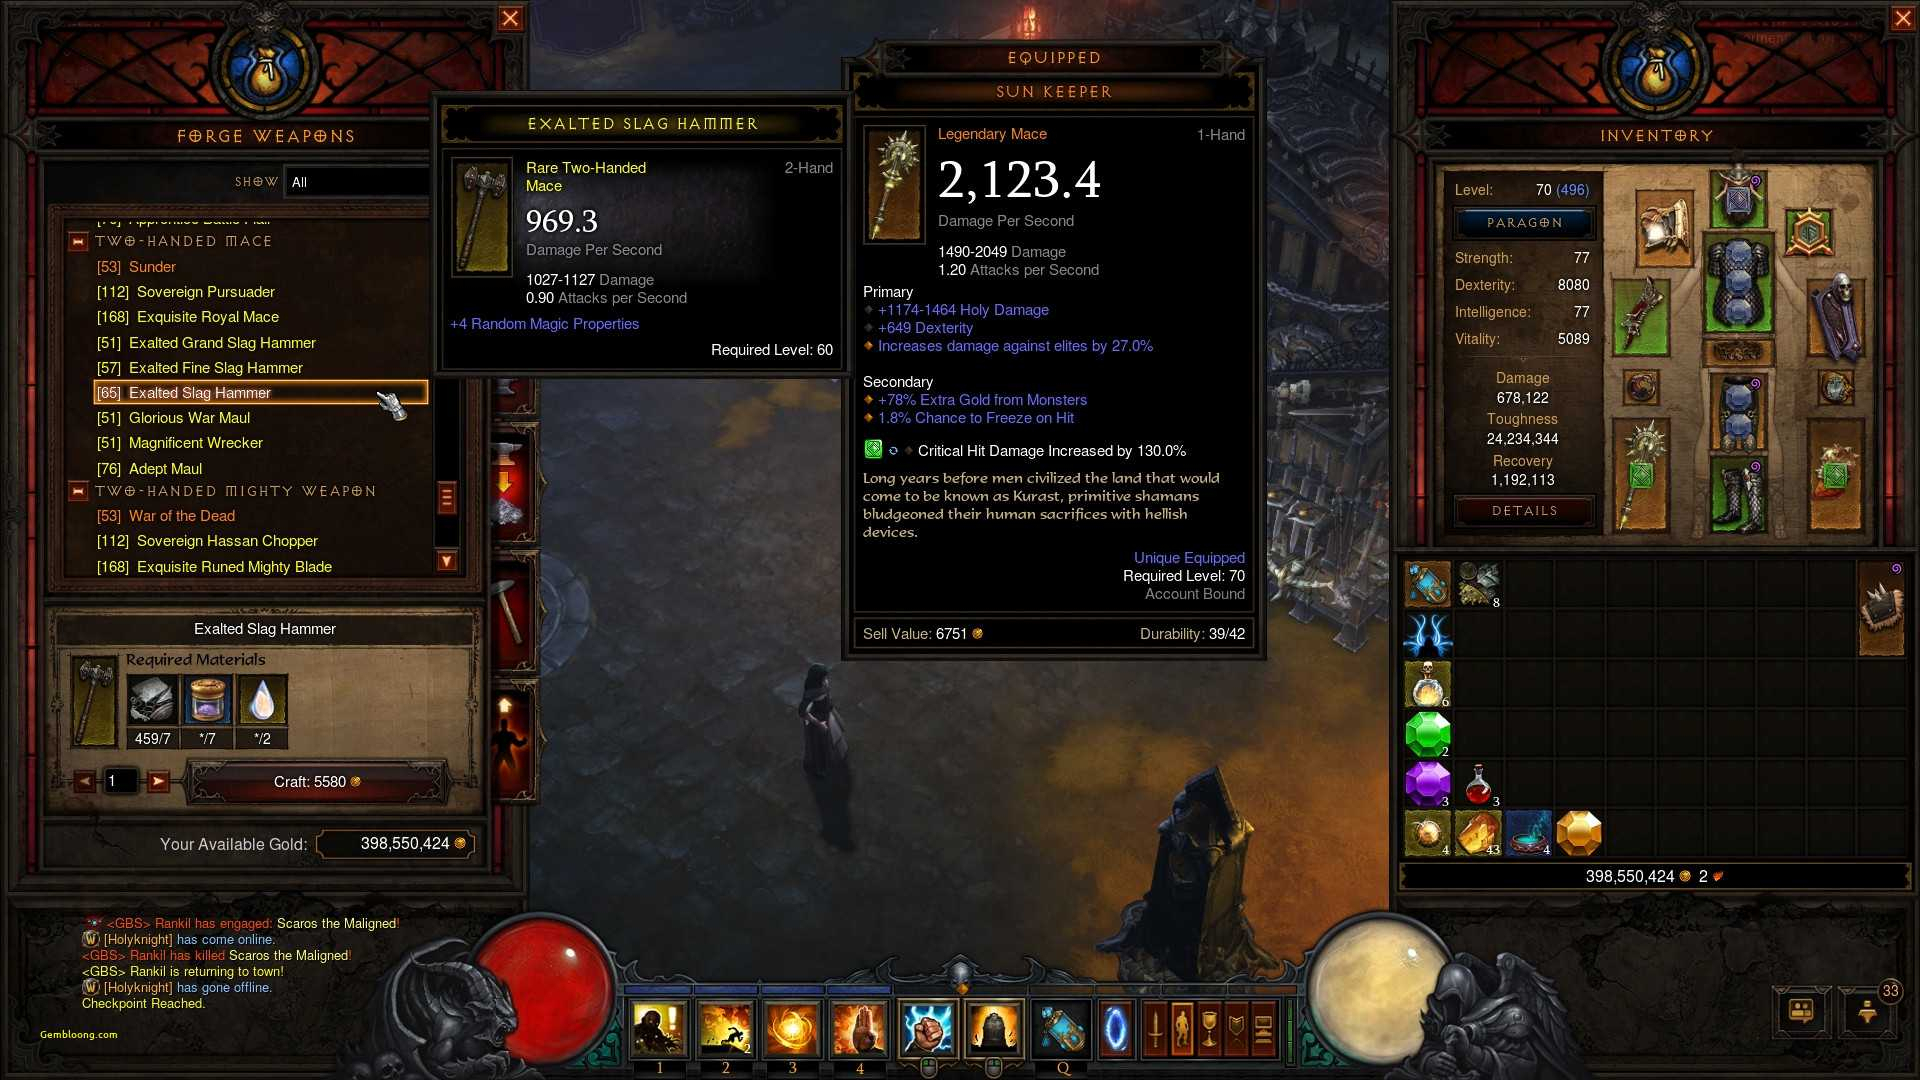 Diablo 3 Leveling Spreadsheet With Diablo 3 Leveling Spreadsheet  Awal Mula